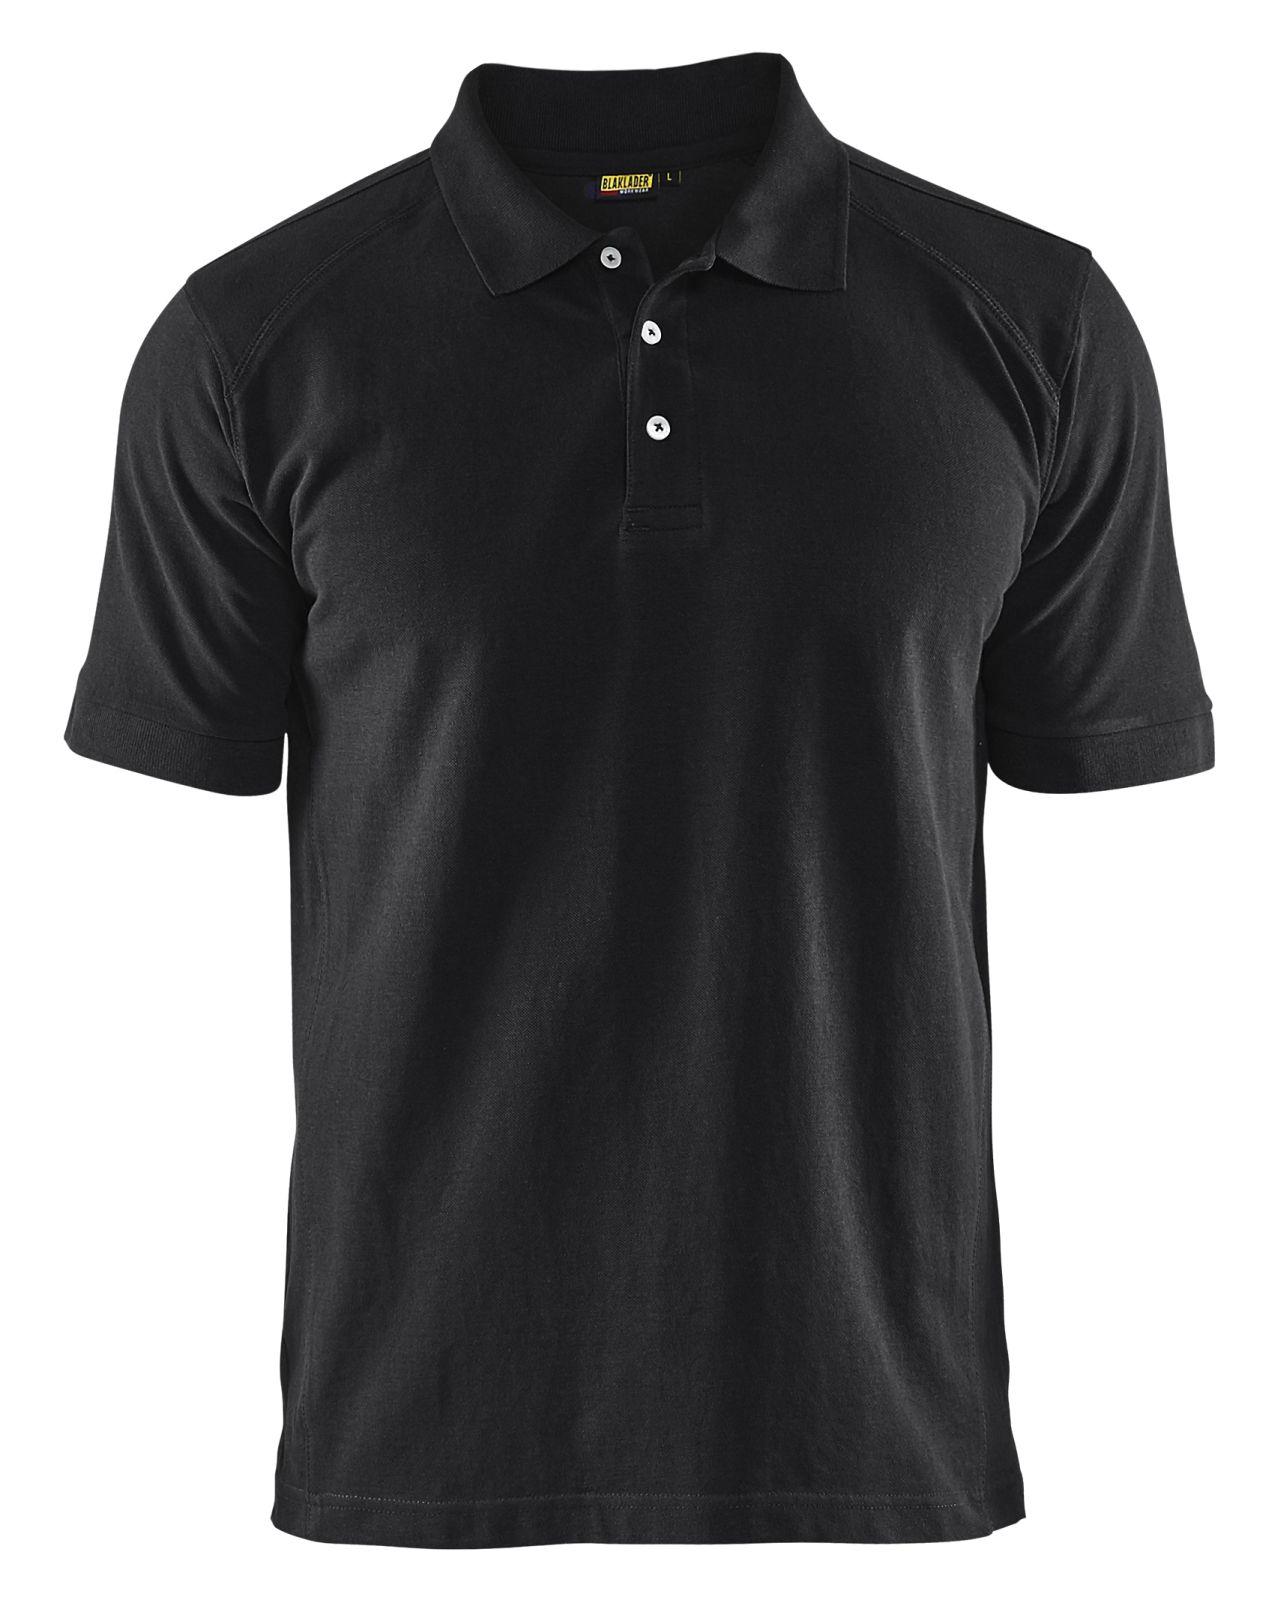 Blaklader Polo shirts 33241050 zwart(9900)